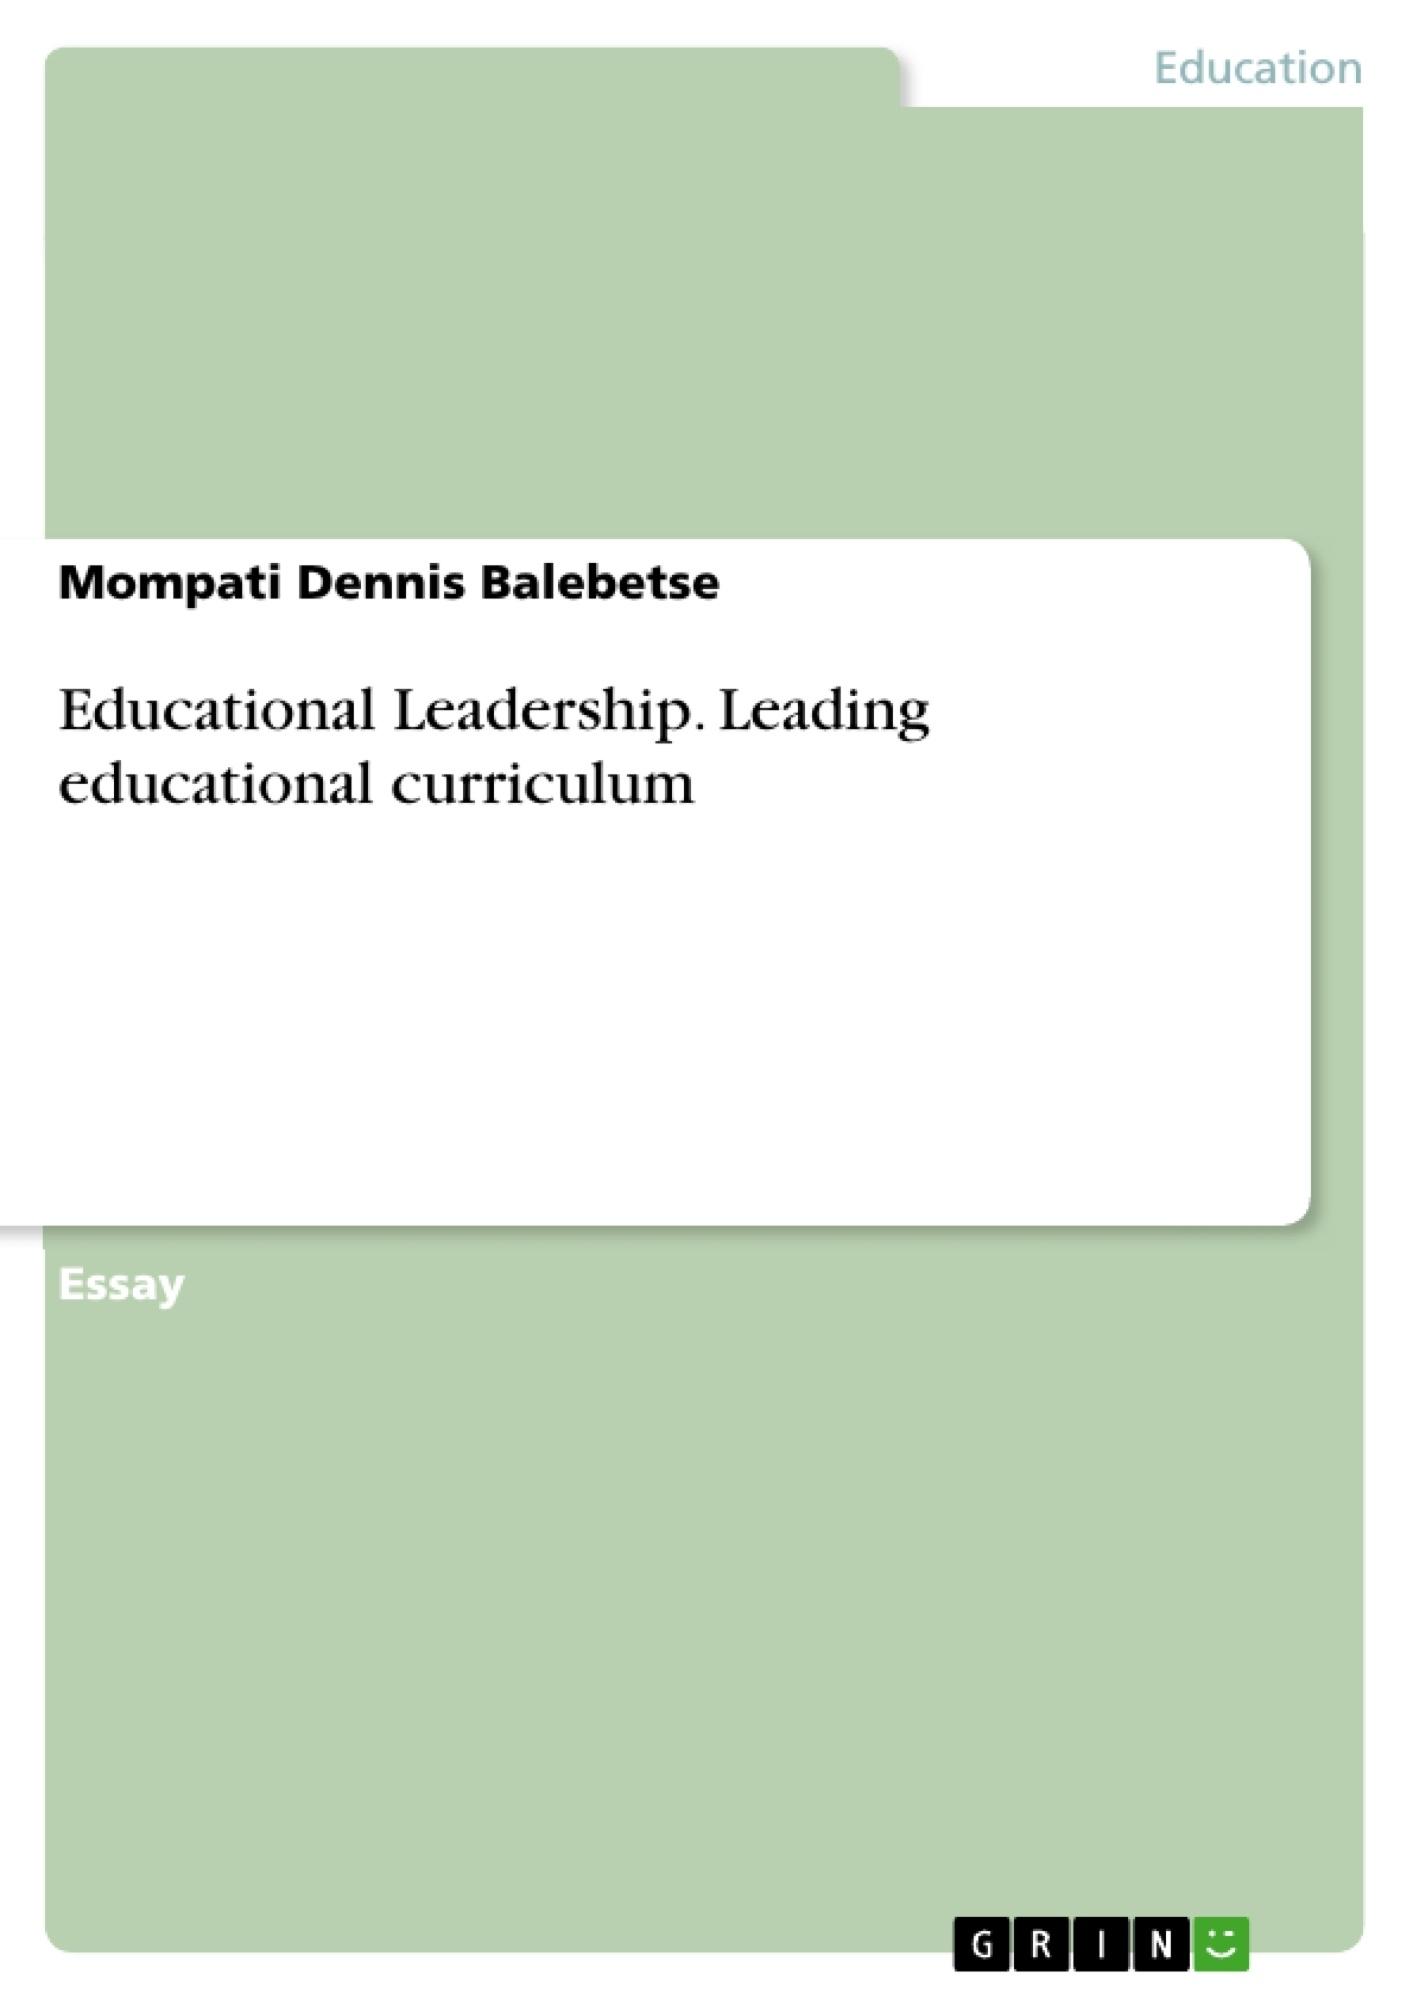 Title: Educational Leadership. Leading educational curriculum